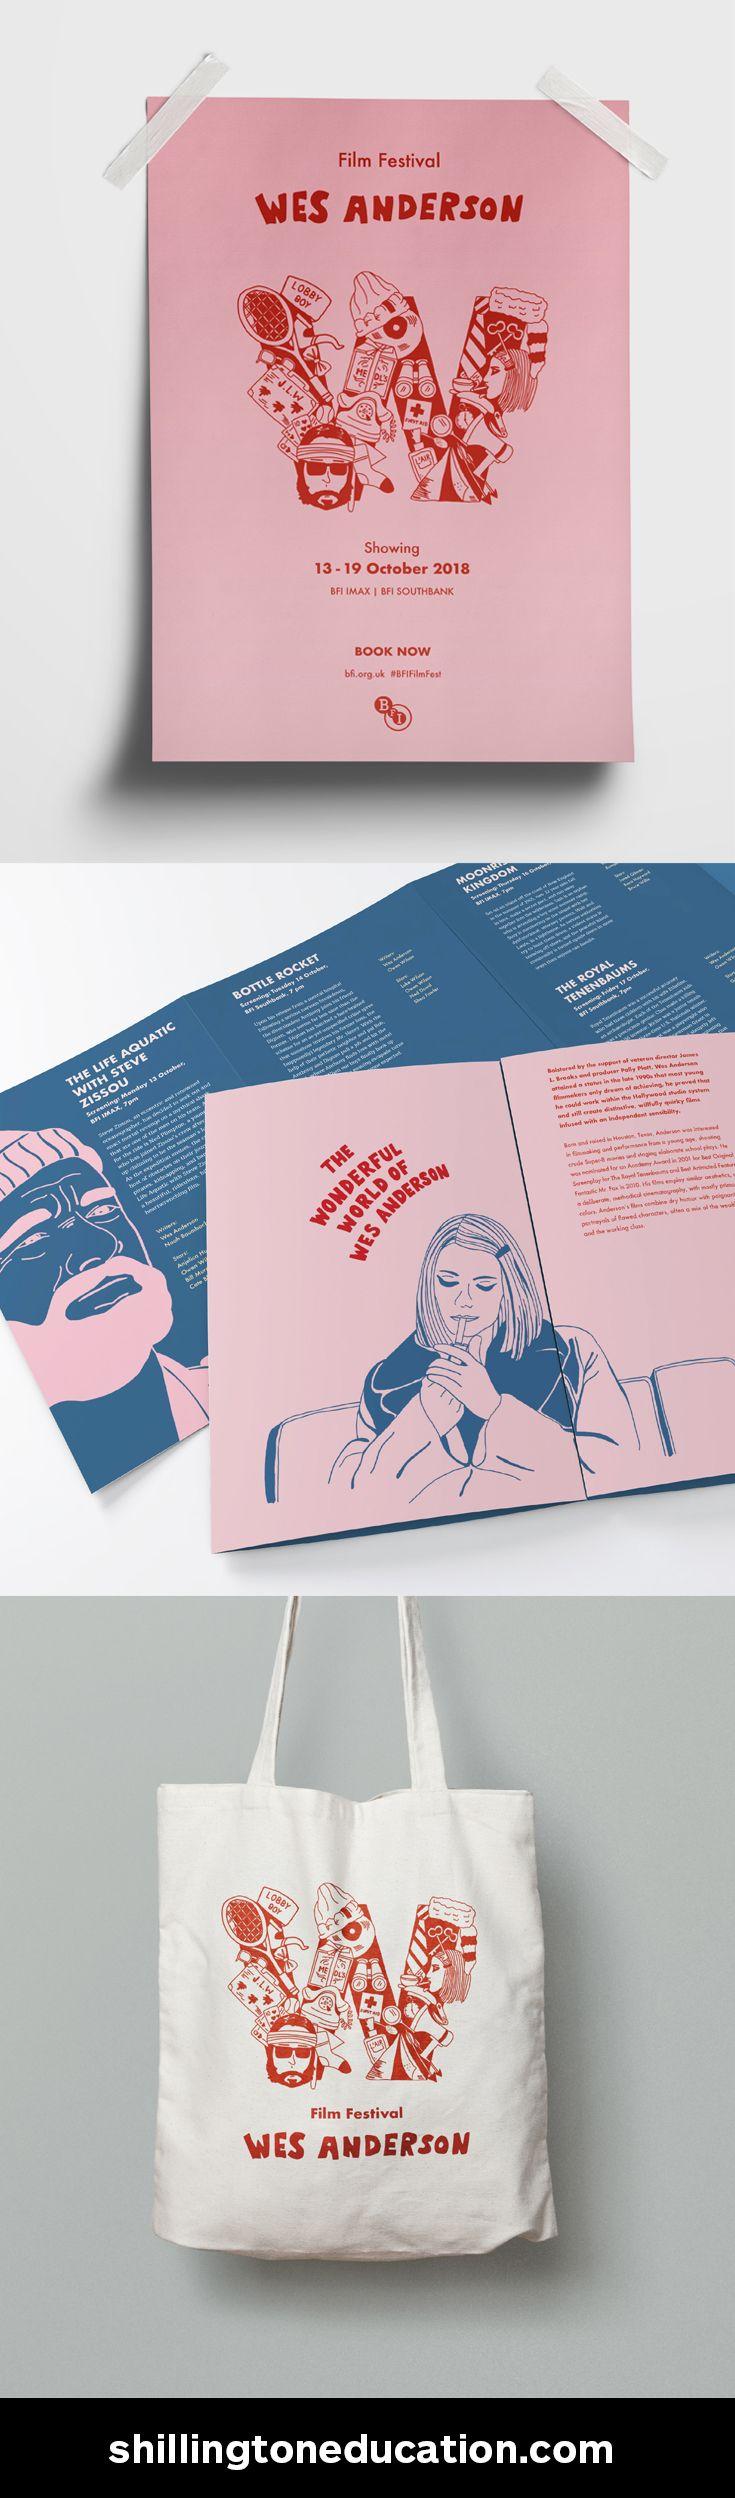 Film Brochure by Kraitip Sivakriskul, Shillington Graduate. #MadeAtShillington #ShillingtonEducation #GraphicDesign #Portfolio #DesignSchool #Branding #Poster #Brochure #Illustration